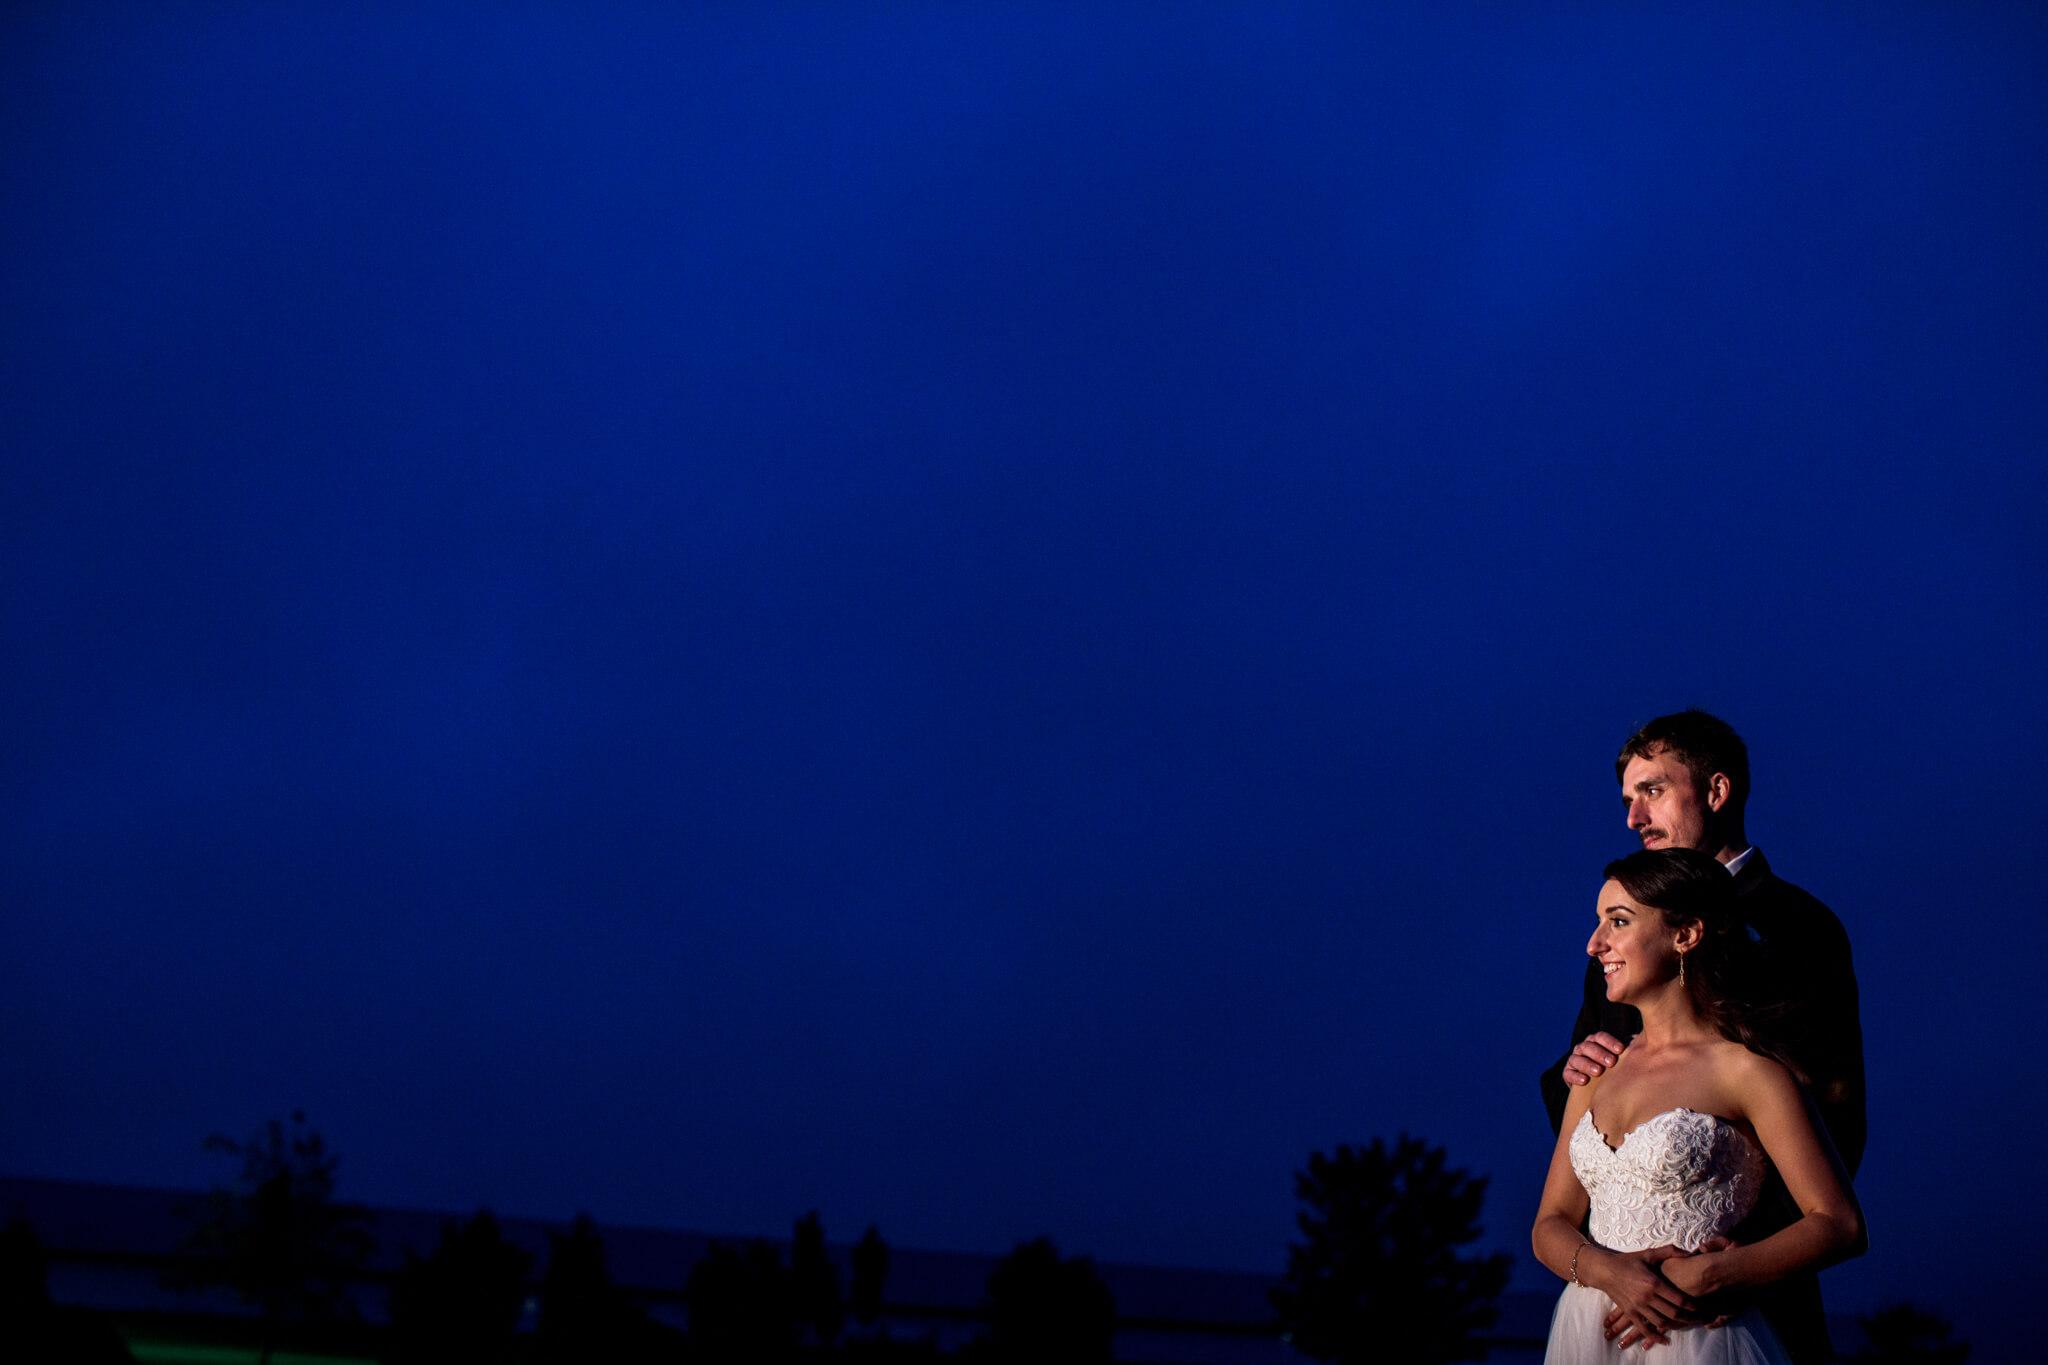 Alysia Jerad Homestead Blessings Farm Hershey PA Wedding Rustic Chique - 95.JPG